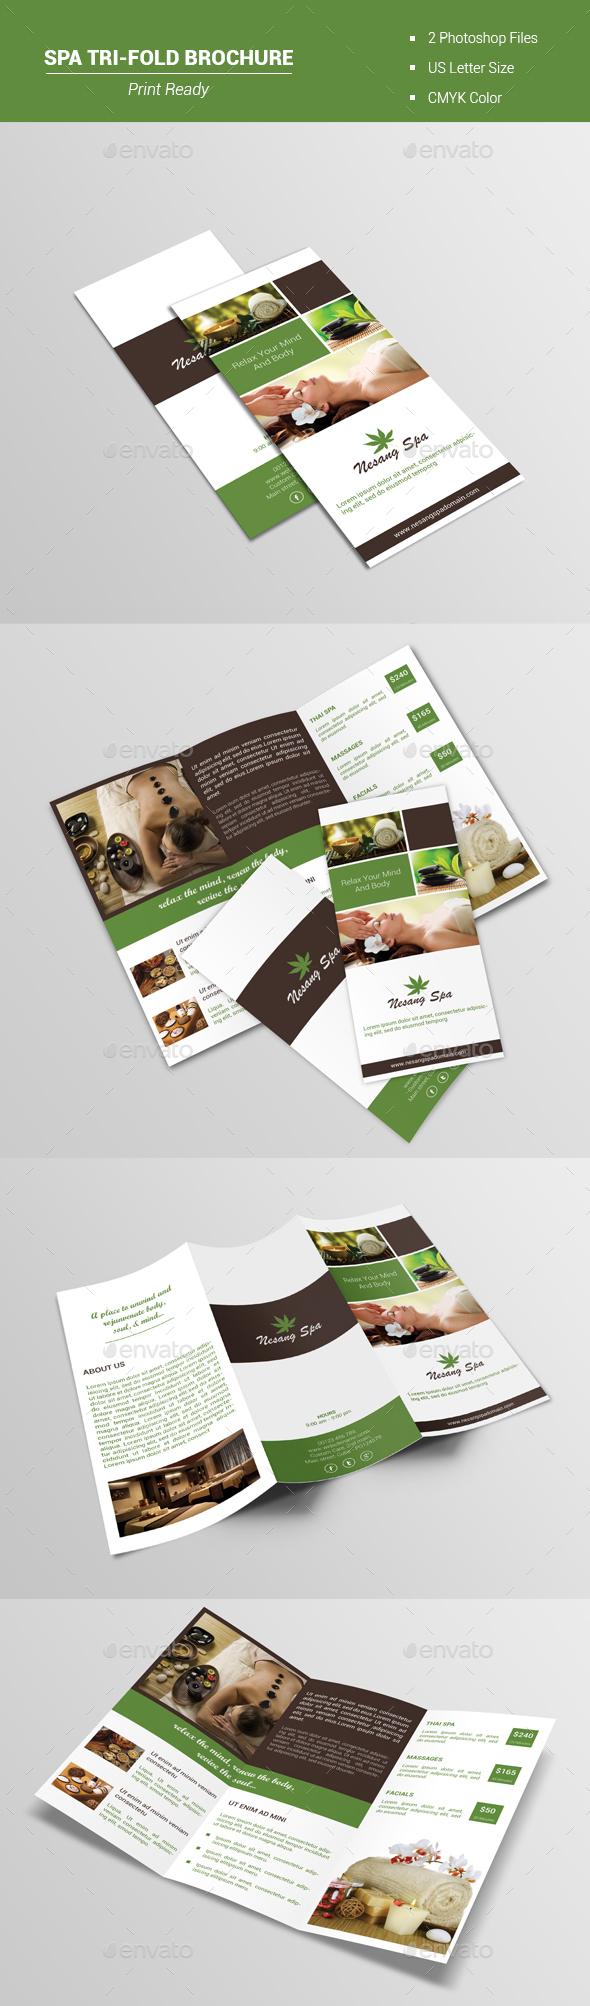 Spa Tri-Fold Brochure V1 - Brochures Print Templates